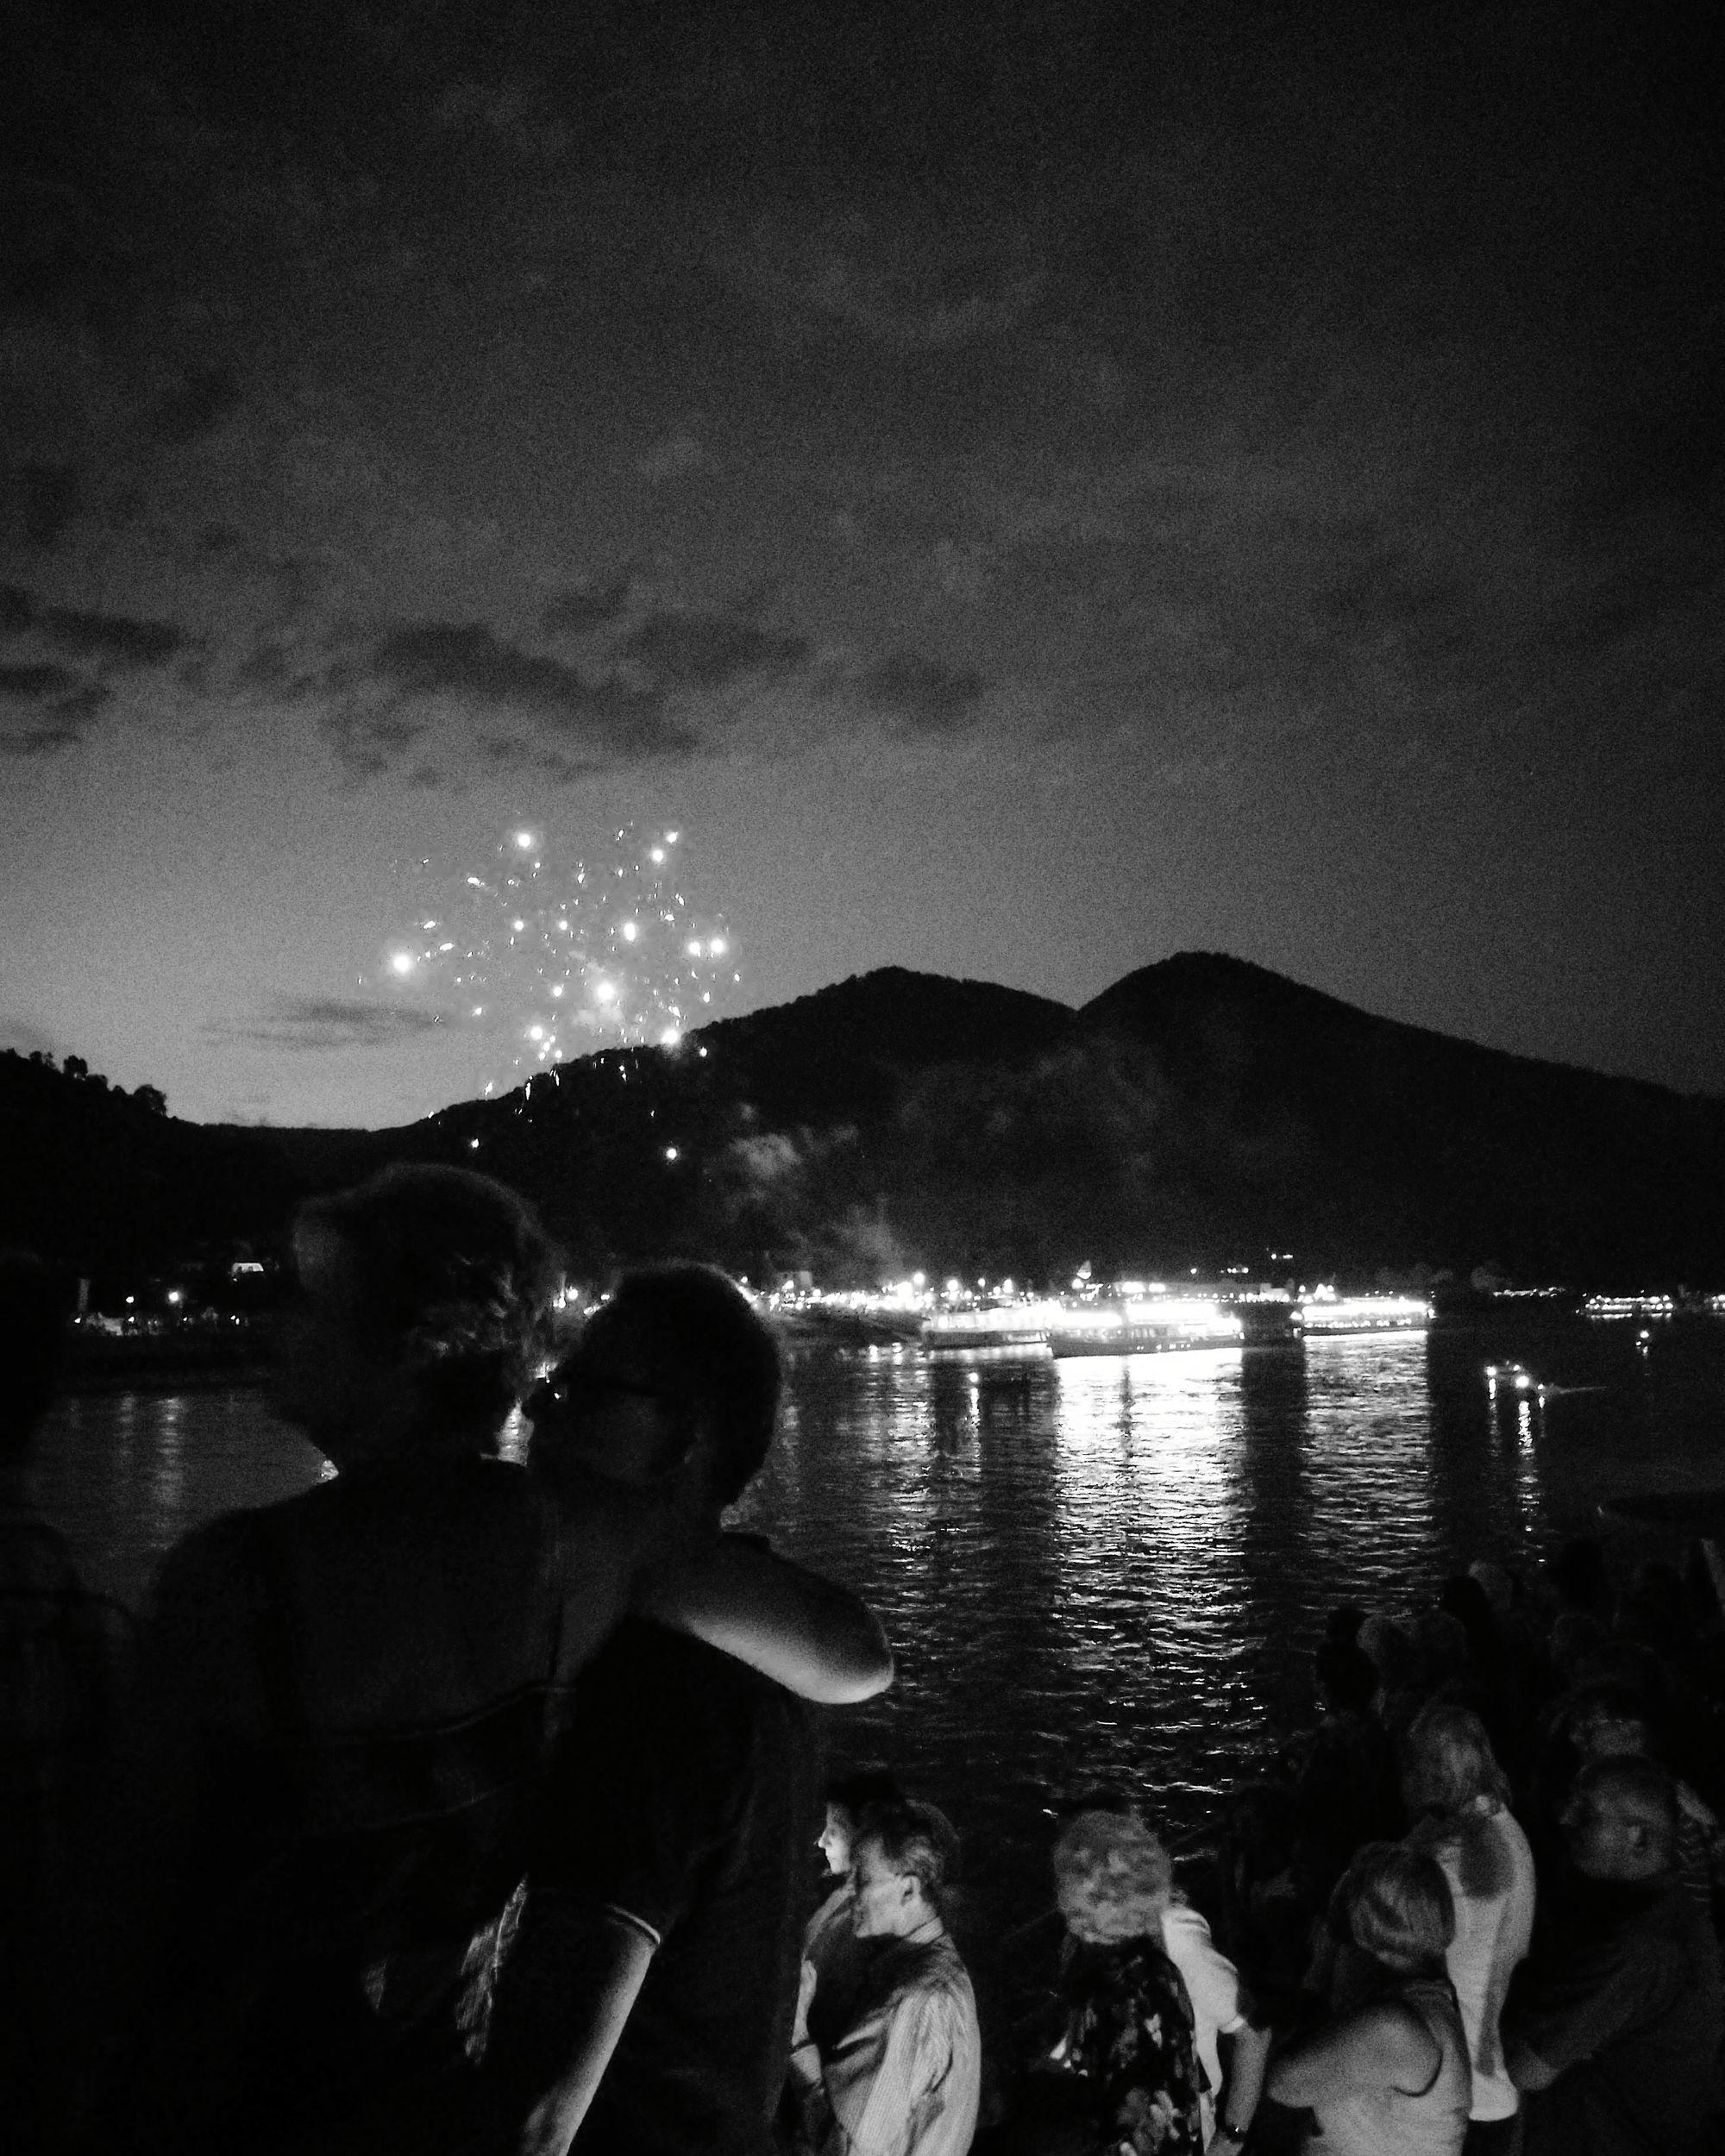 collect memories❤️ Mountain Nature Water Night Outdoors Lake Sky People Wachau/Austria Schifffahrt Spitz An Der Donau Boat Ride Memories First Eyeem Photo